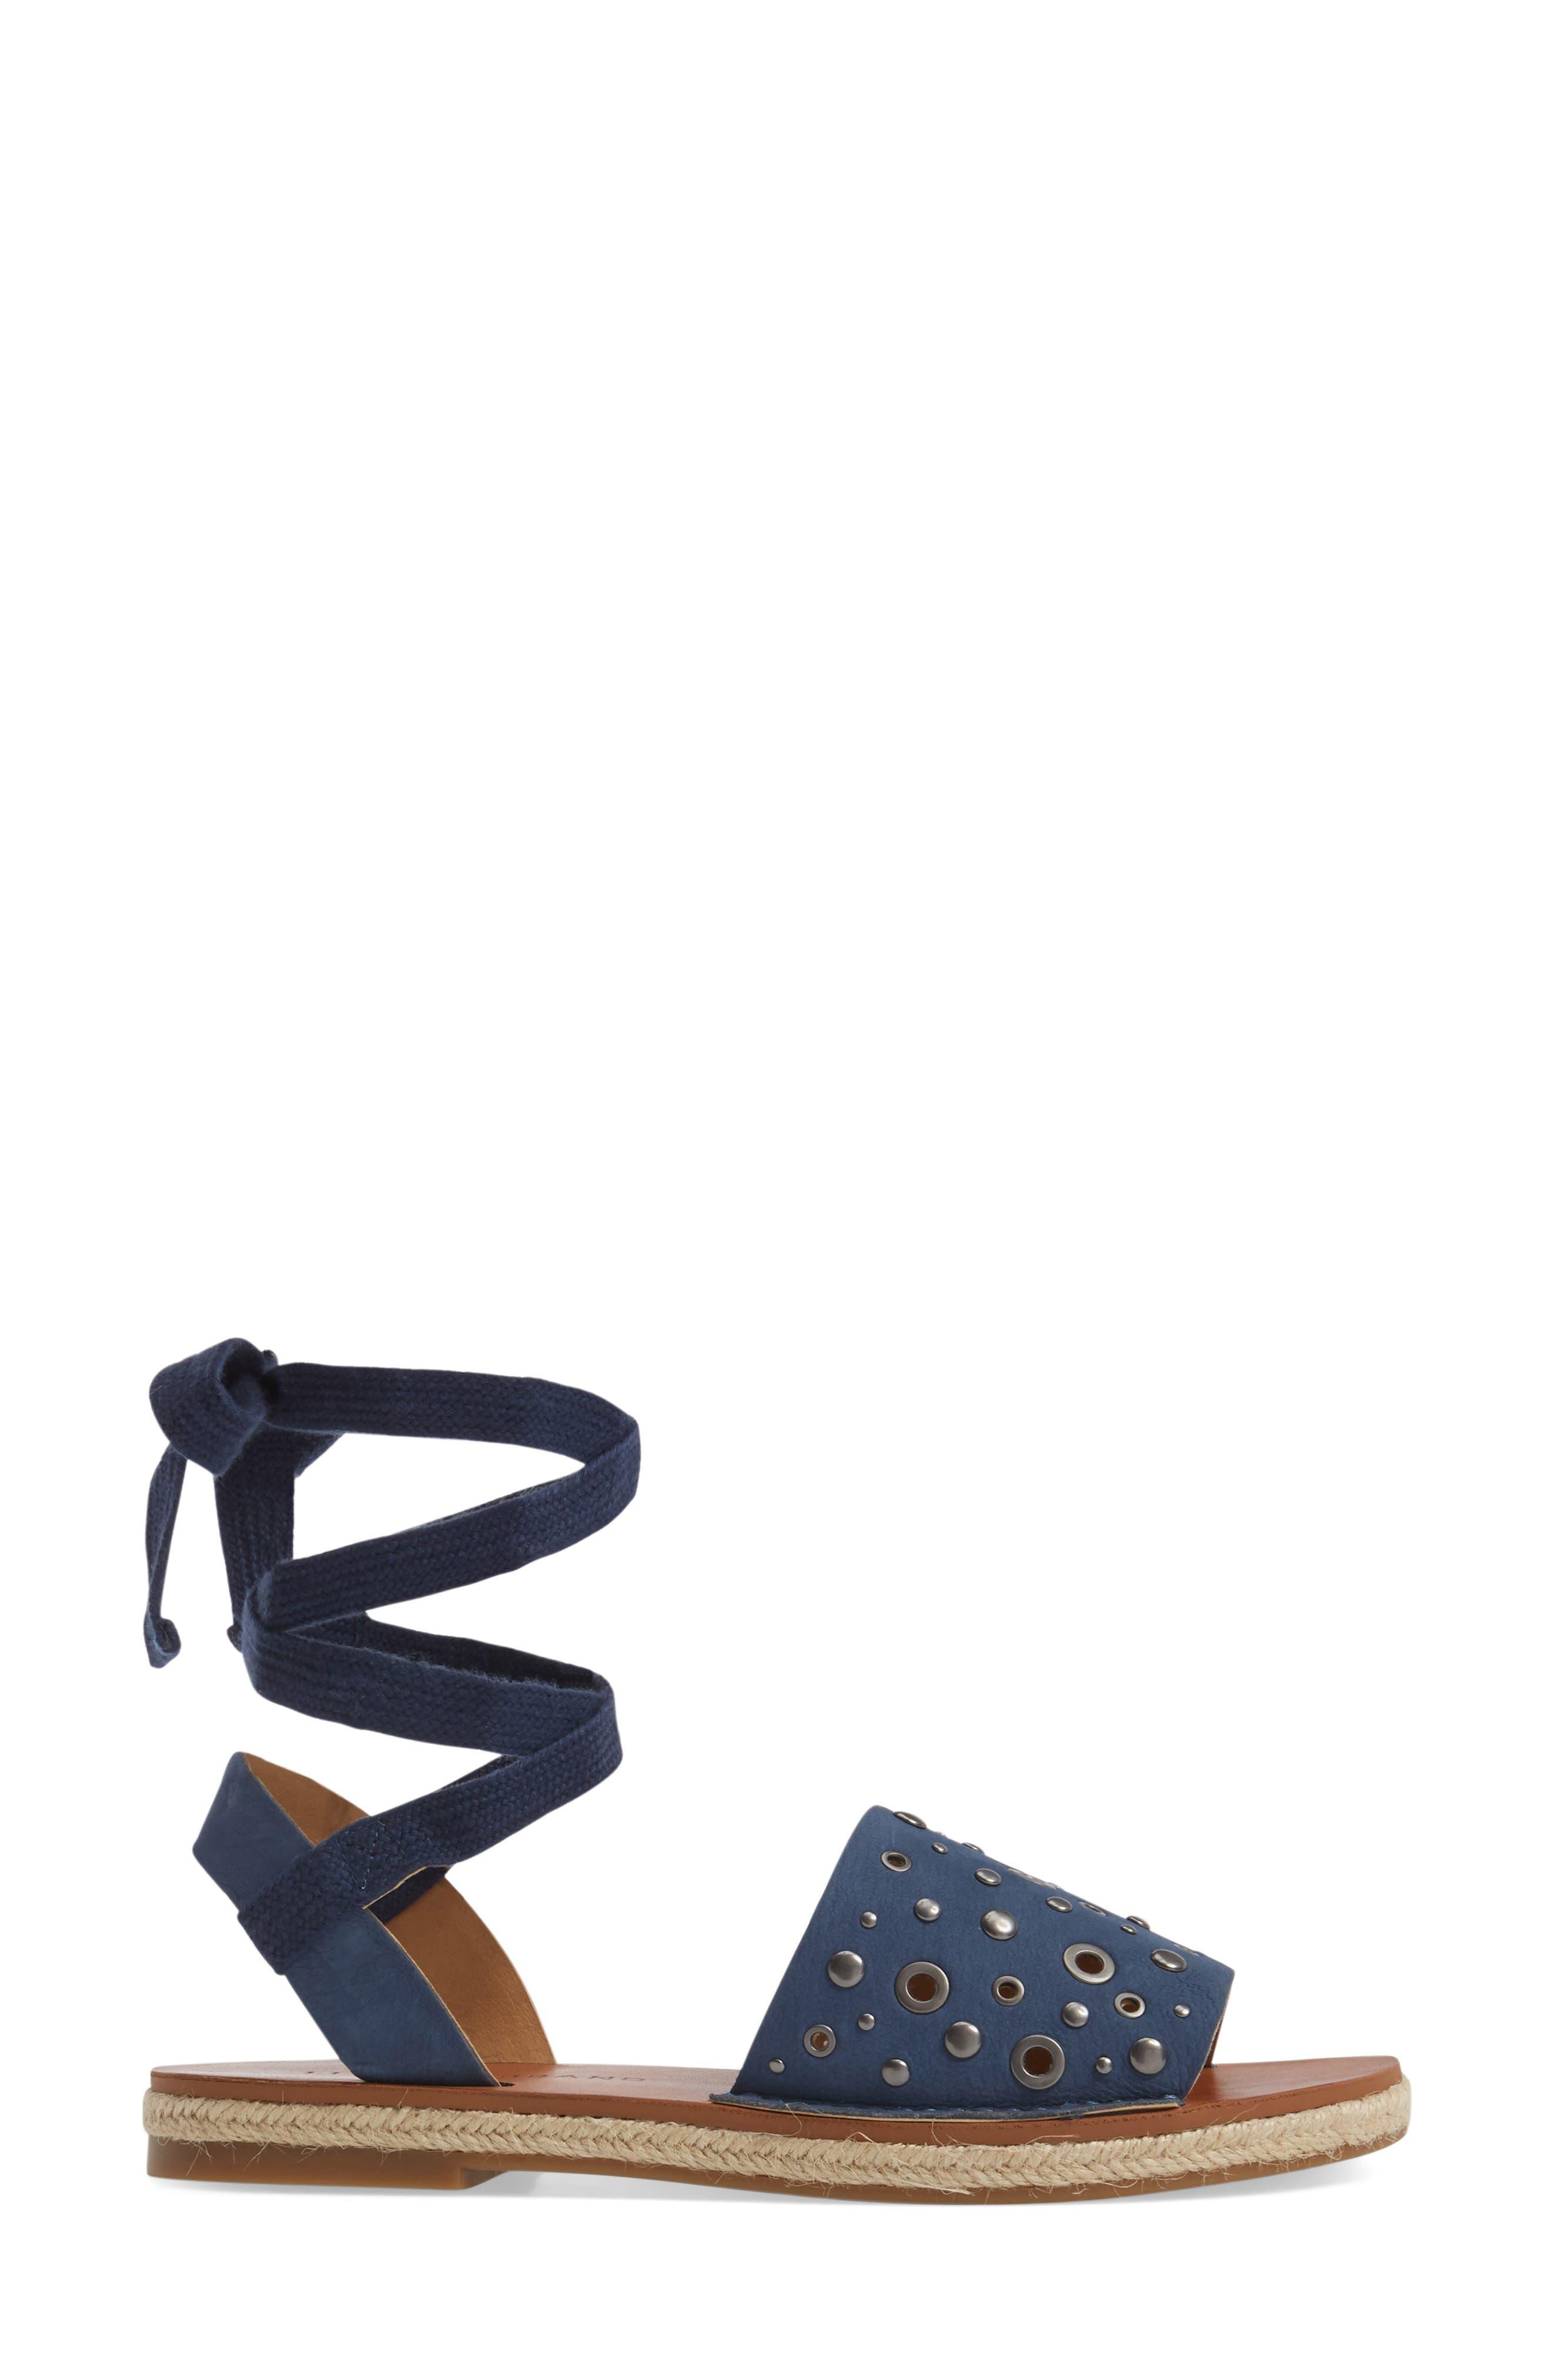 Daytah Ankle Tie Sandal,                             Alternate thumbnail 12, color,